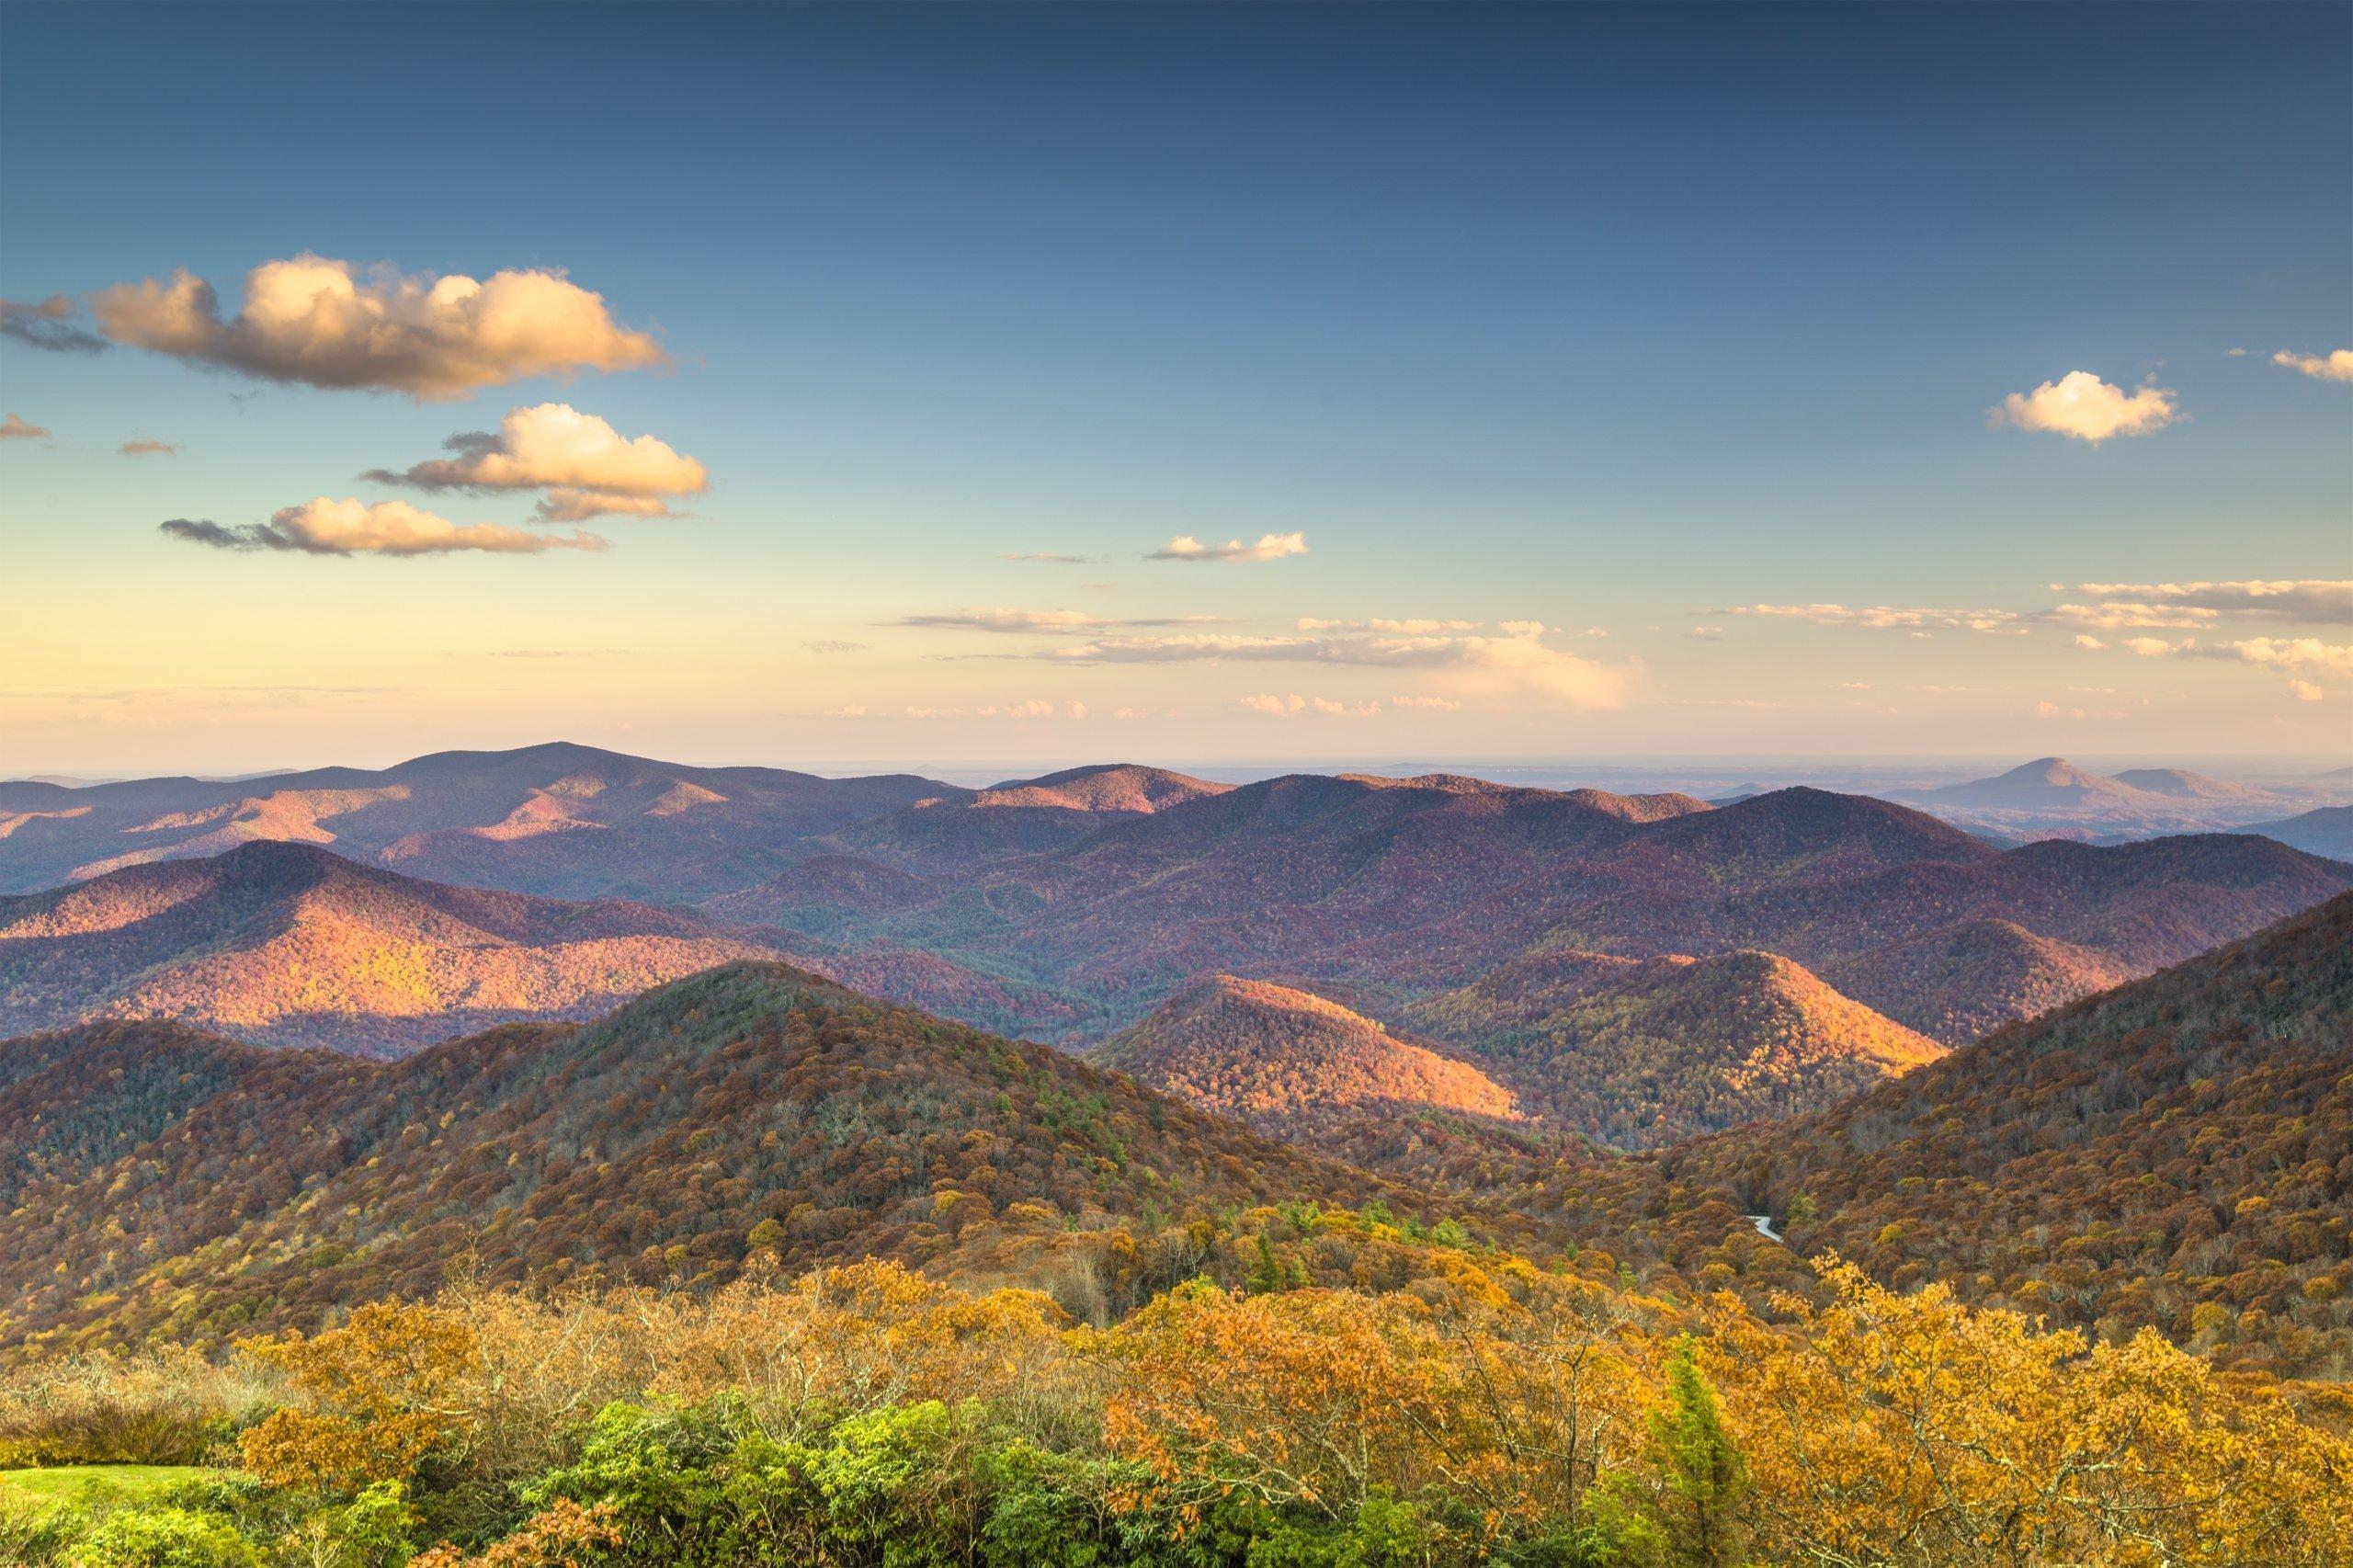 Blue Ridge Mountains at dusk in north Georgia, USA.